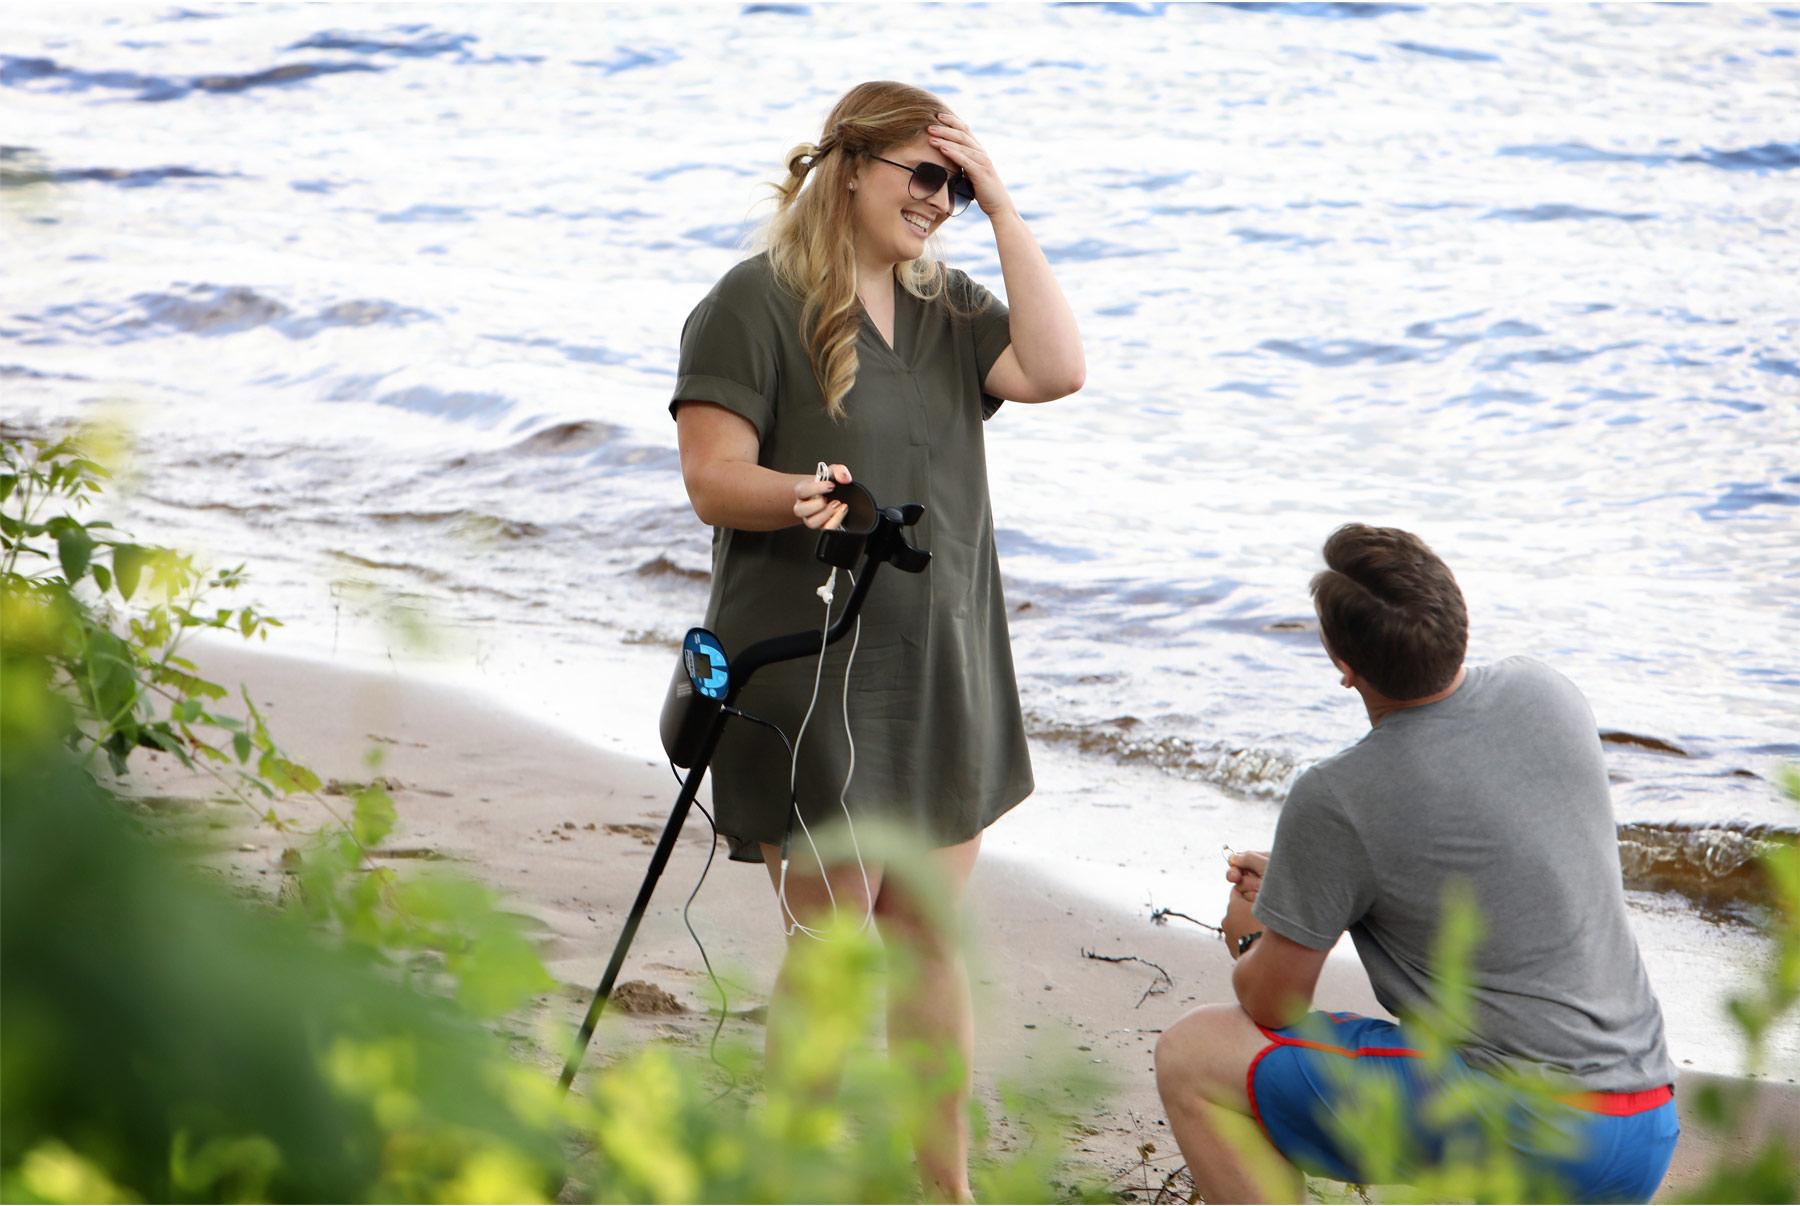 04-Vick-Photography-Proposal-Minnesota-Minneapolis-Beach-Metal-Detectors-Veronica-and-Tyler.jpg